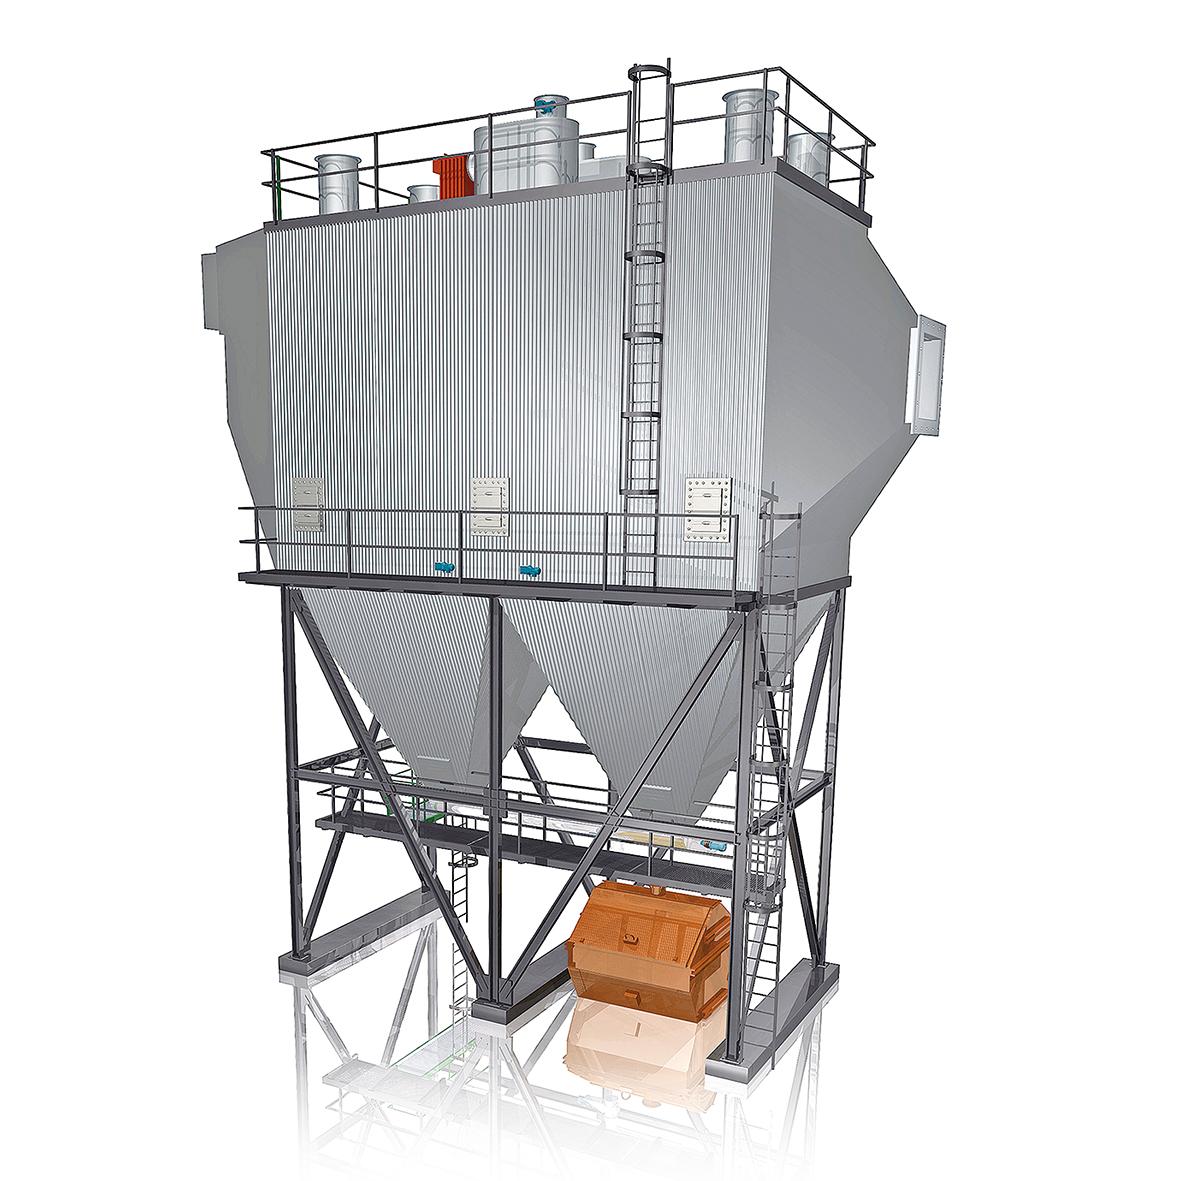 BETH Industrial Electrostatic Precipitator rr bethfiltration #8E411C